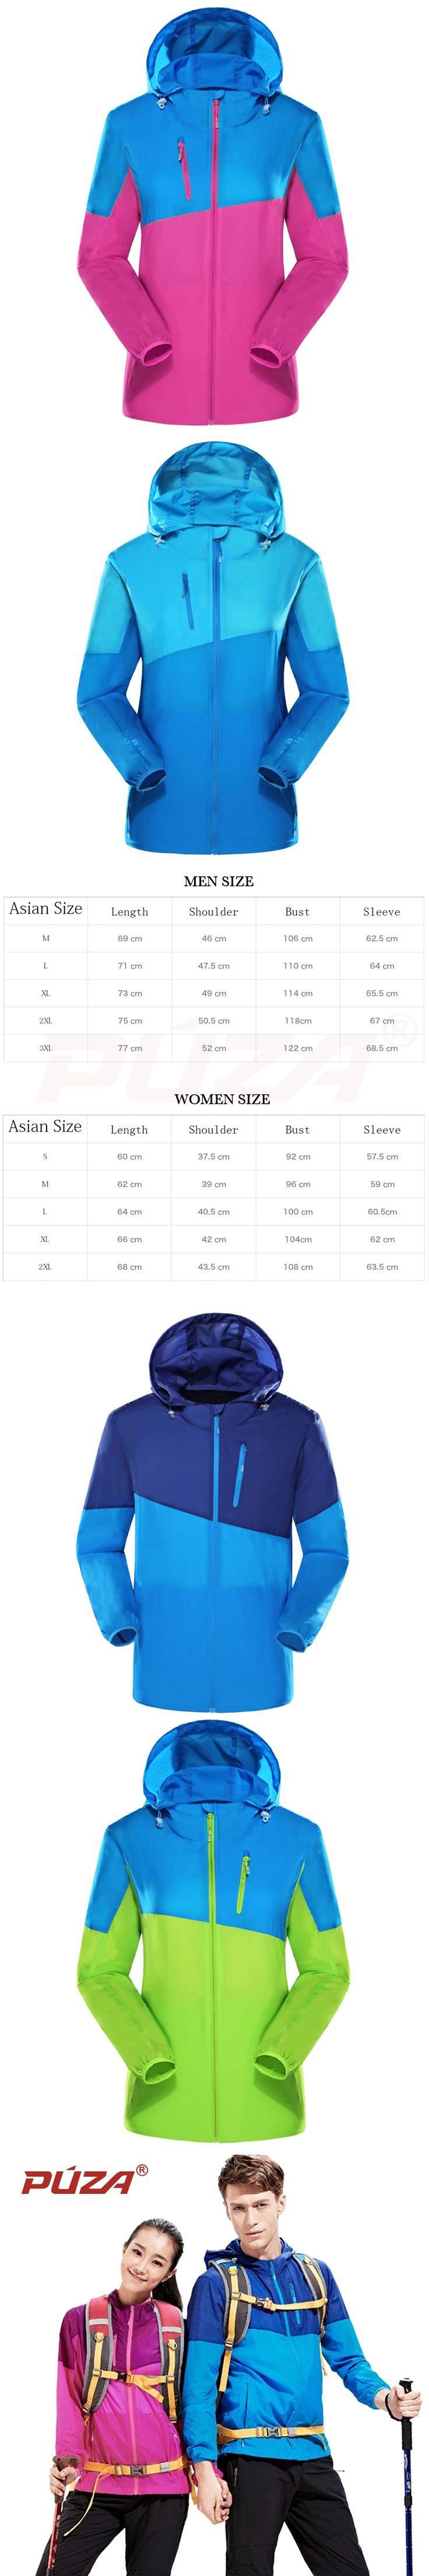 PUZA Brand 5 Color Best Selling Women Men Ultra-light Waterproof Jacket Quick-dry Clothes Skinsuit Outwear Plus Size S-XXXL